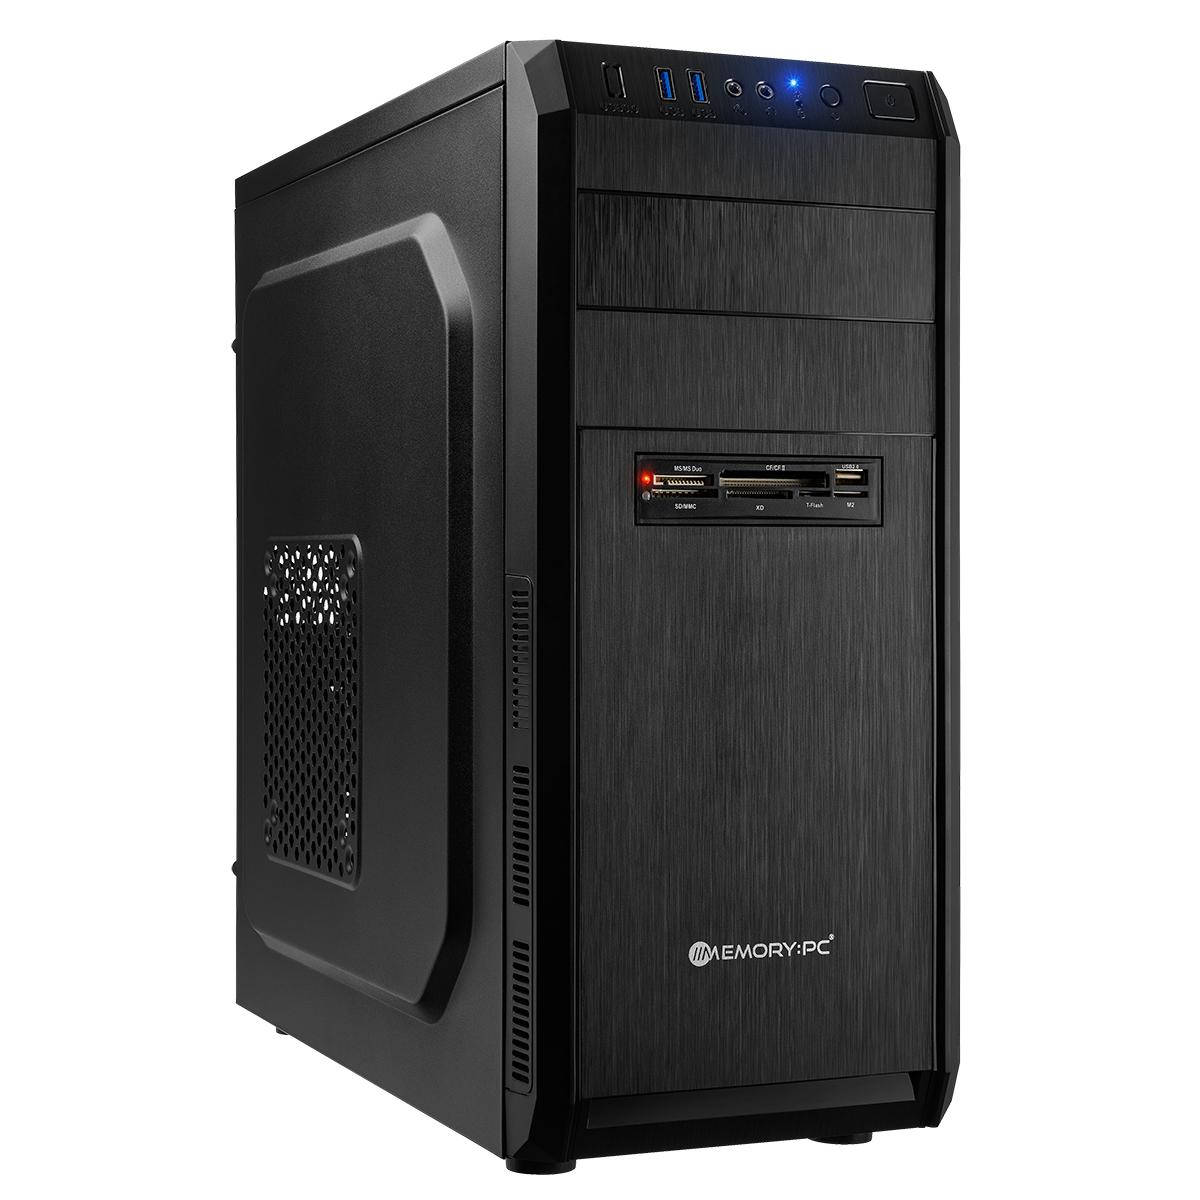 PC AMD Ryzen 3 2200G 4x 3.50GHz, 8Go DDR4 2666 MHz, Radeon Vega 8, 120 GB SSD